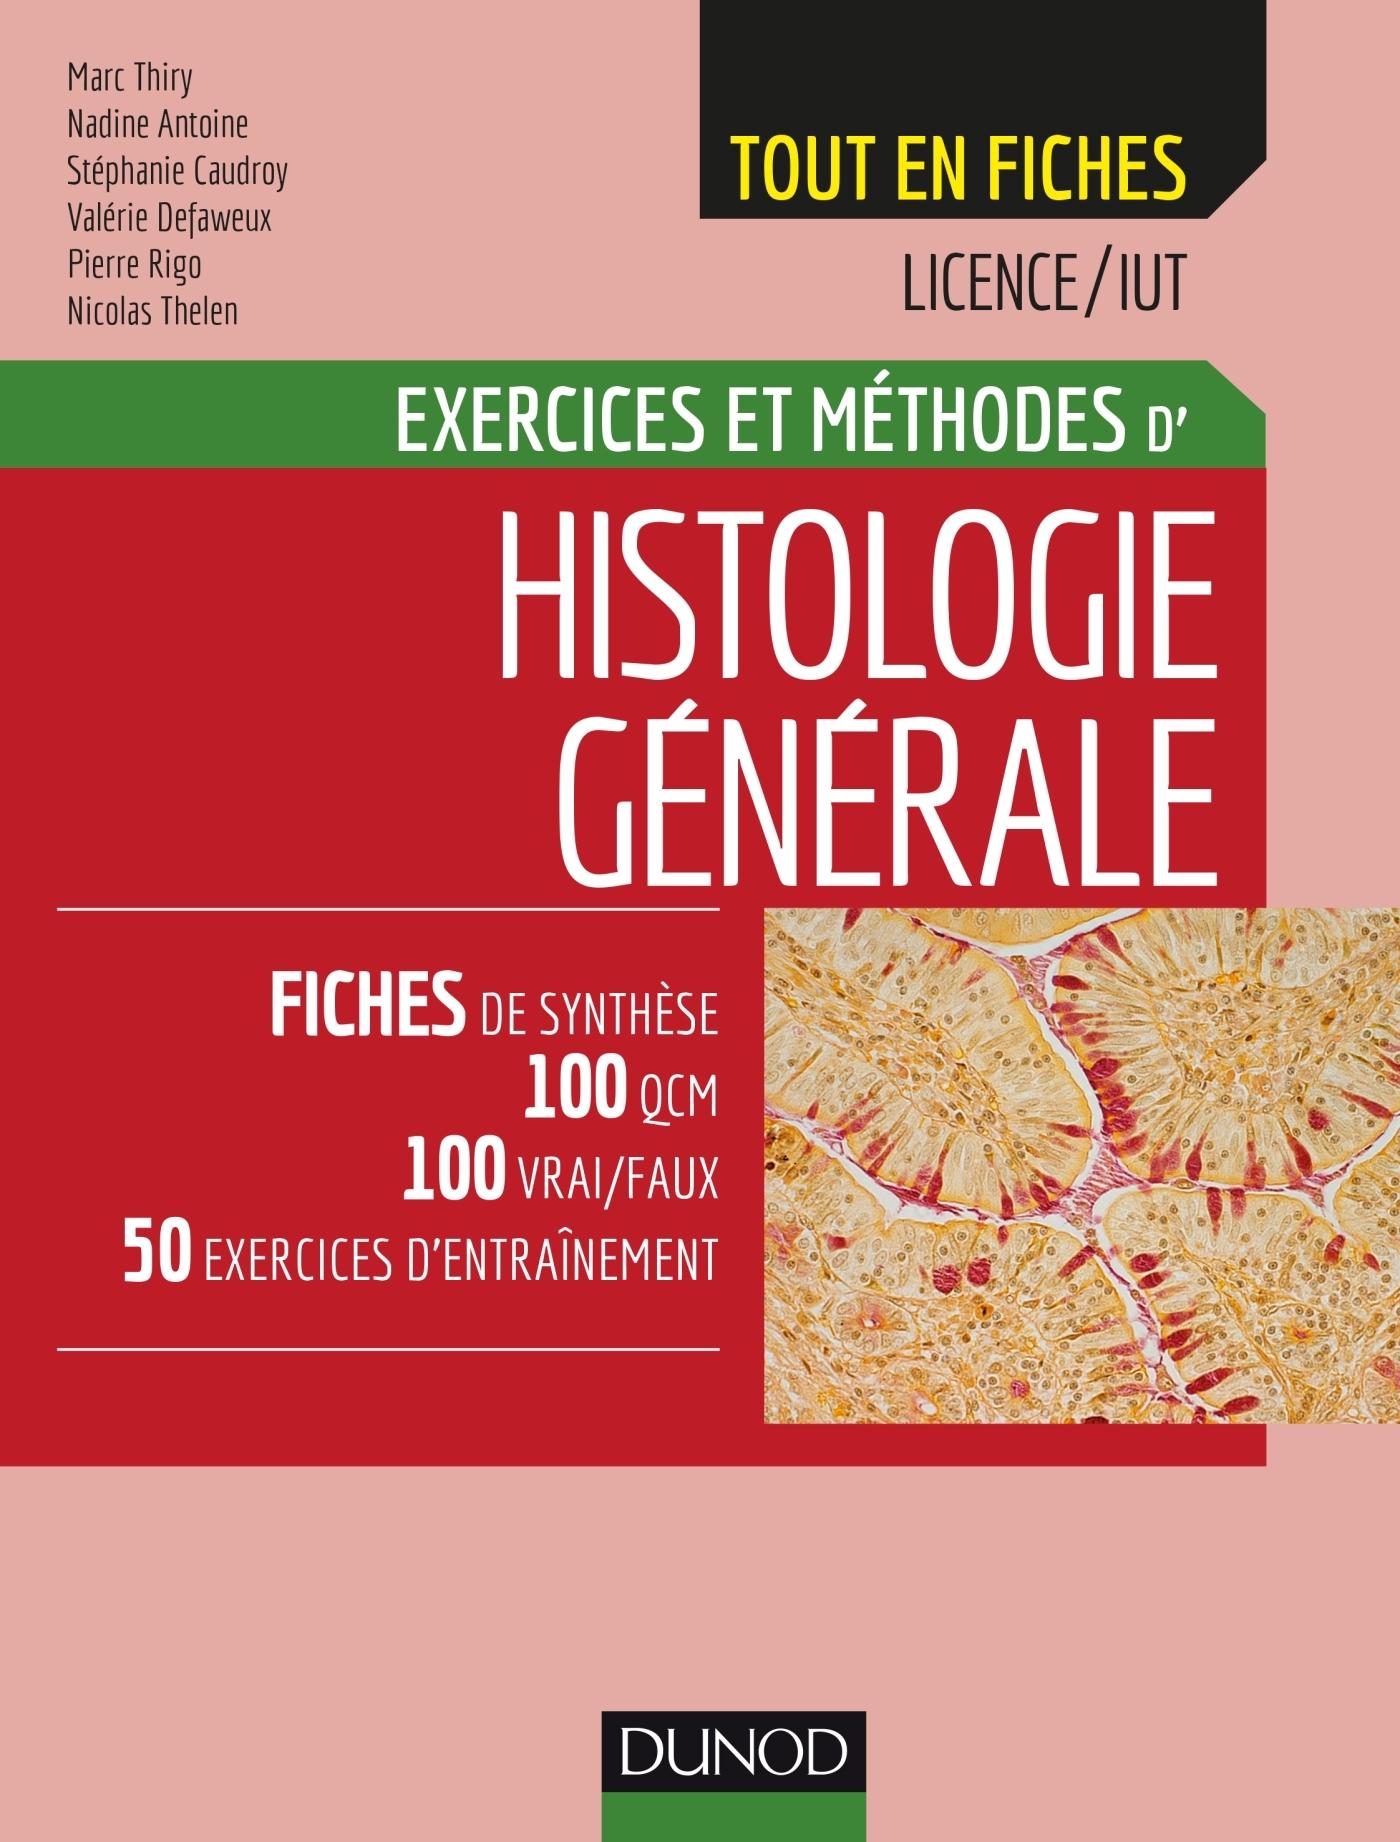 HISTOLOGIE GENERALE - EXERCICES ET METHODES